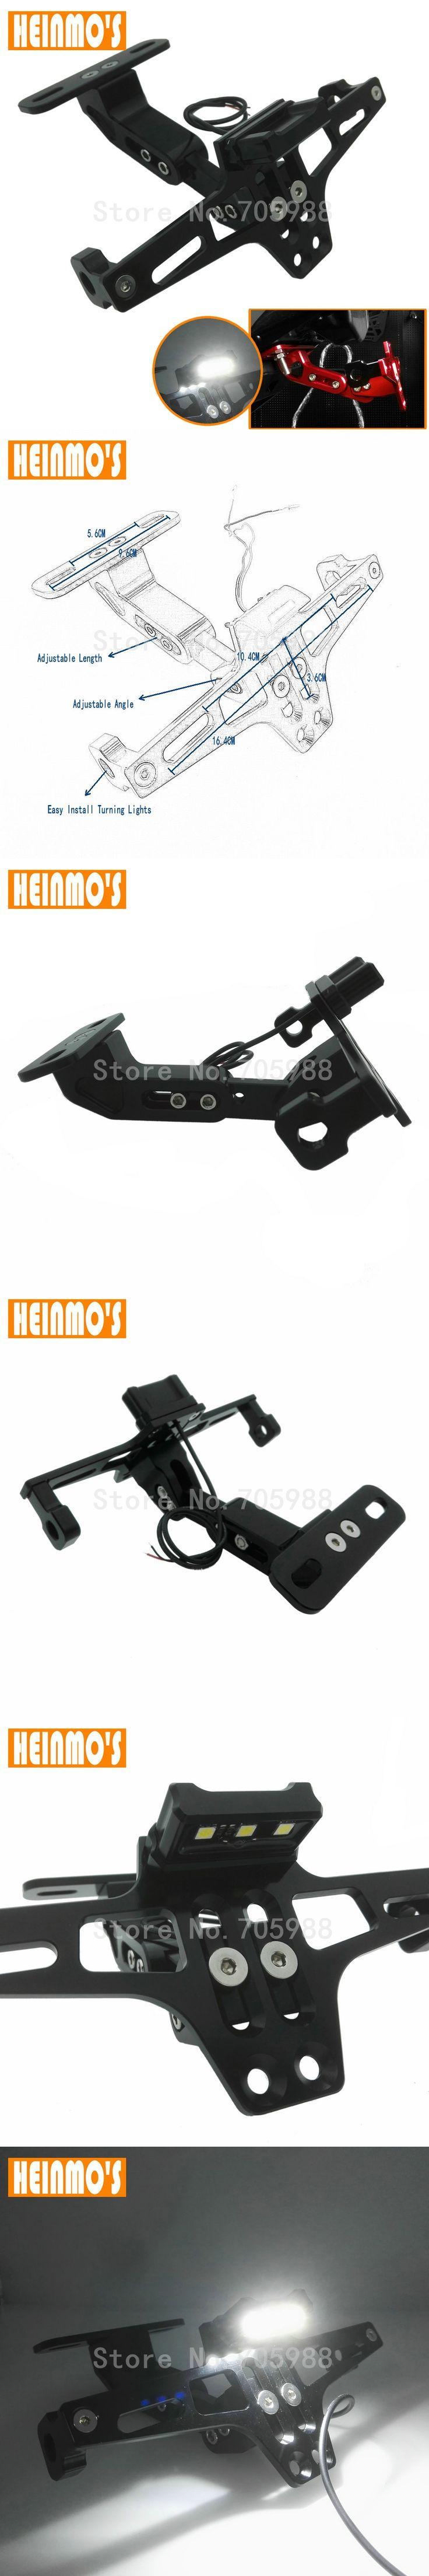 Universal Motorcycle Parts motorbike Adjustable Angle Aluminum License Number Plate Frame Holder Bracket For Honda Yamaha